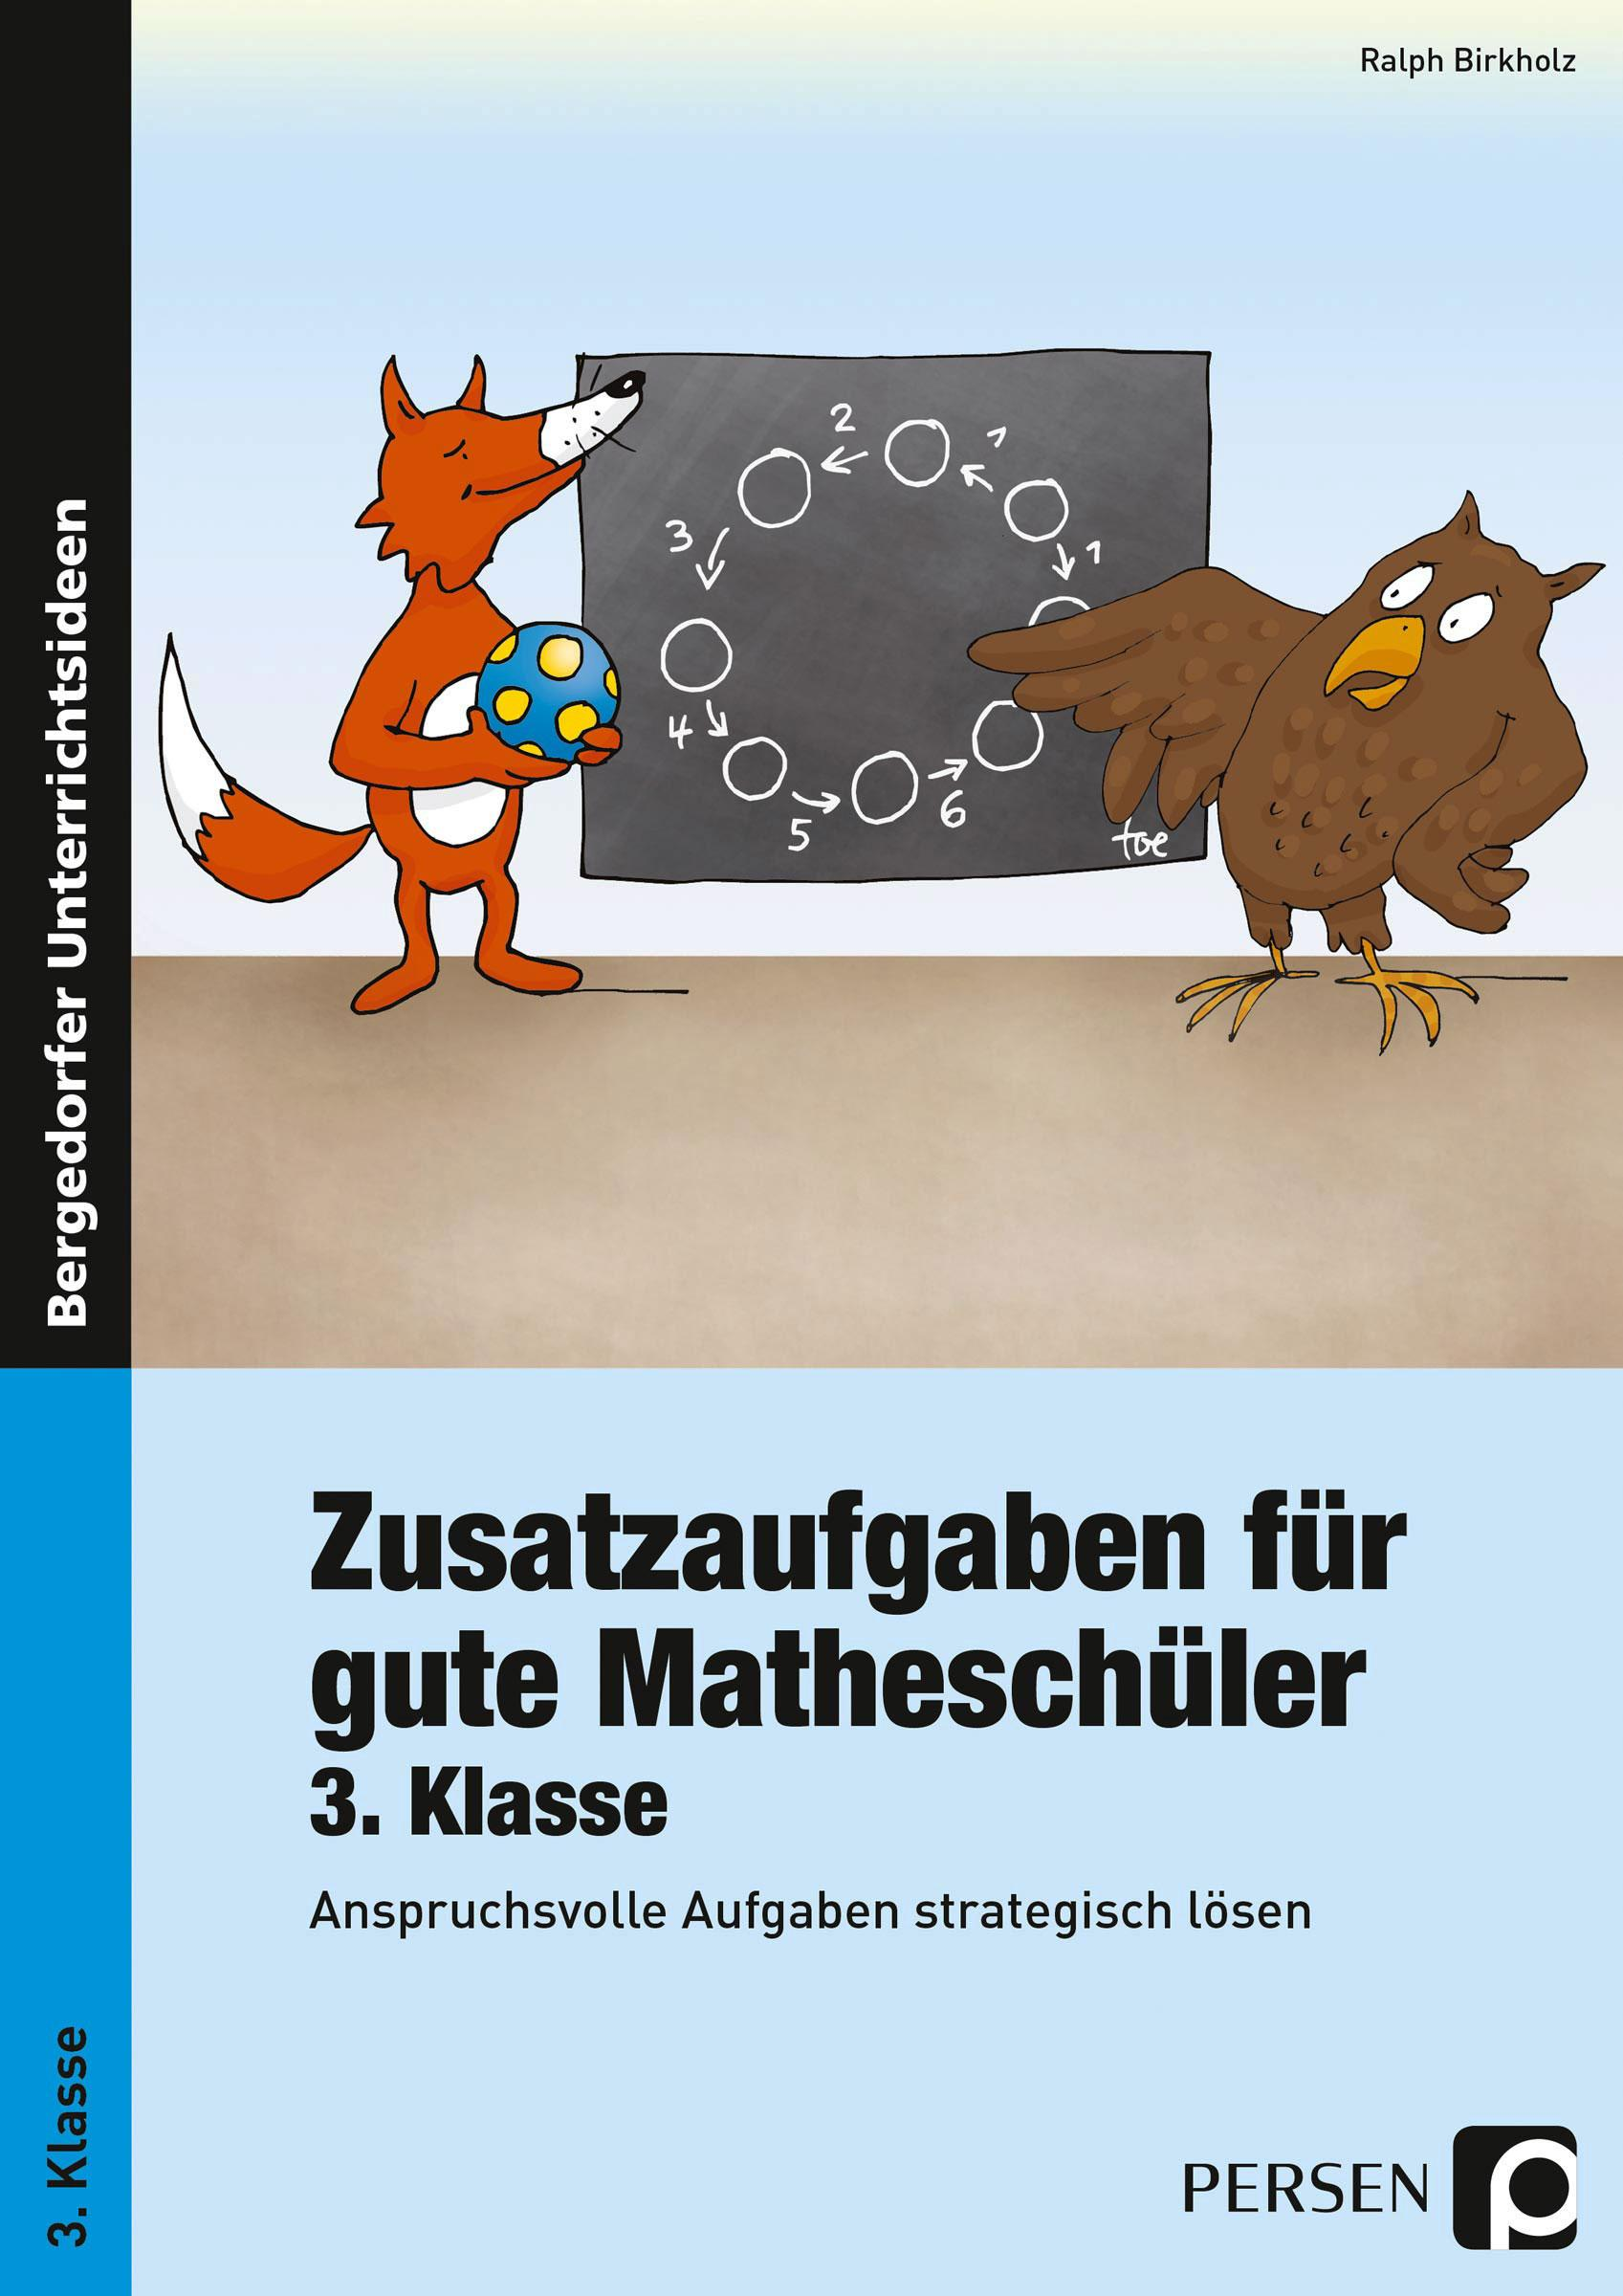 Ralph Birkholz Zusatzaufgaben für gute Matheschüler 3. Klasse